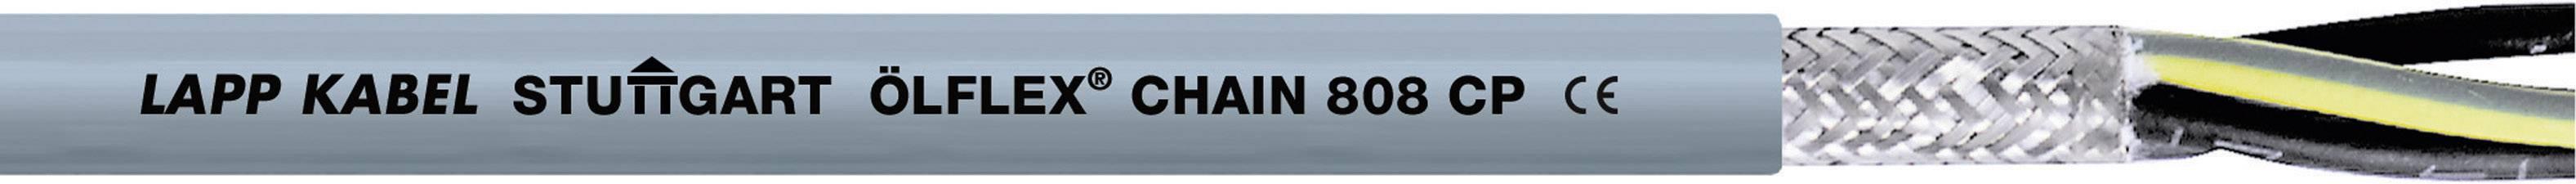 Žíla kabelu LappKabel ÖLFLEX CHAIN 808 CP 18G1,5 (1027781), 18x 1,5 mm², polyurethan, Ø 15,7 mm, stíněný, 50 m